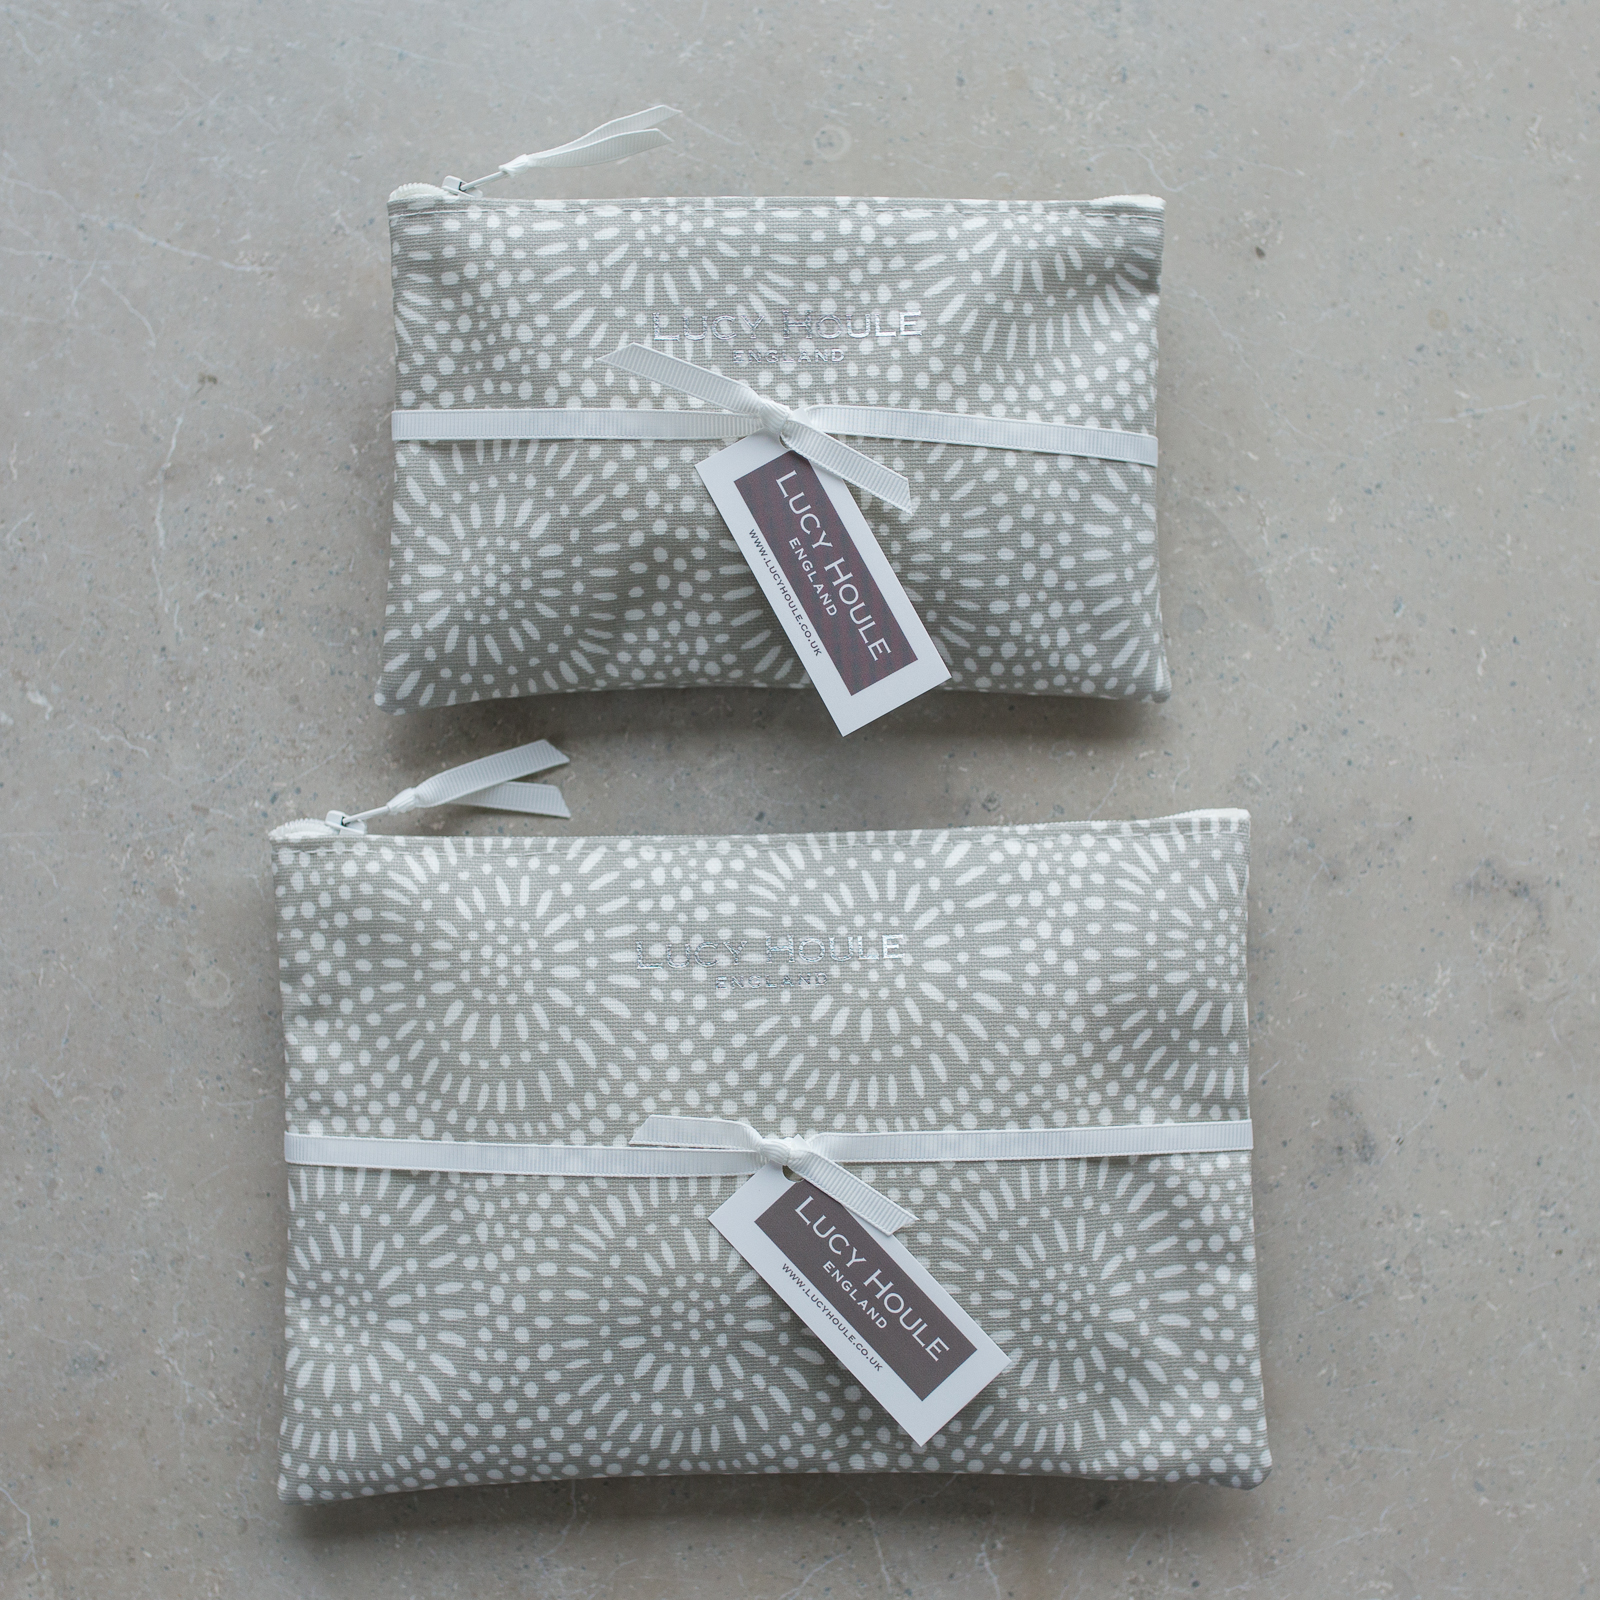 Stone Sunburst  Make-Up Bag with White Zip